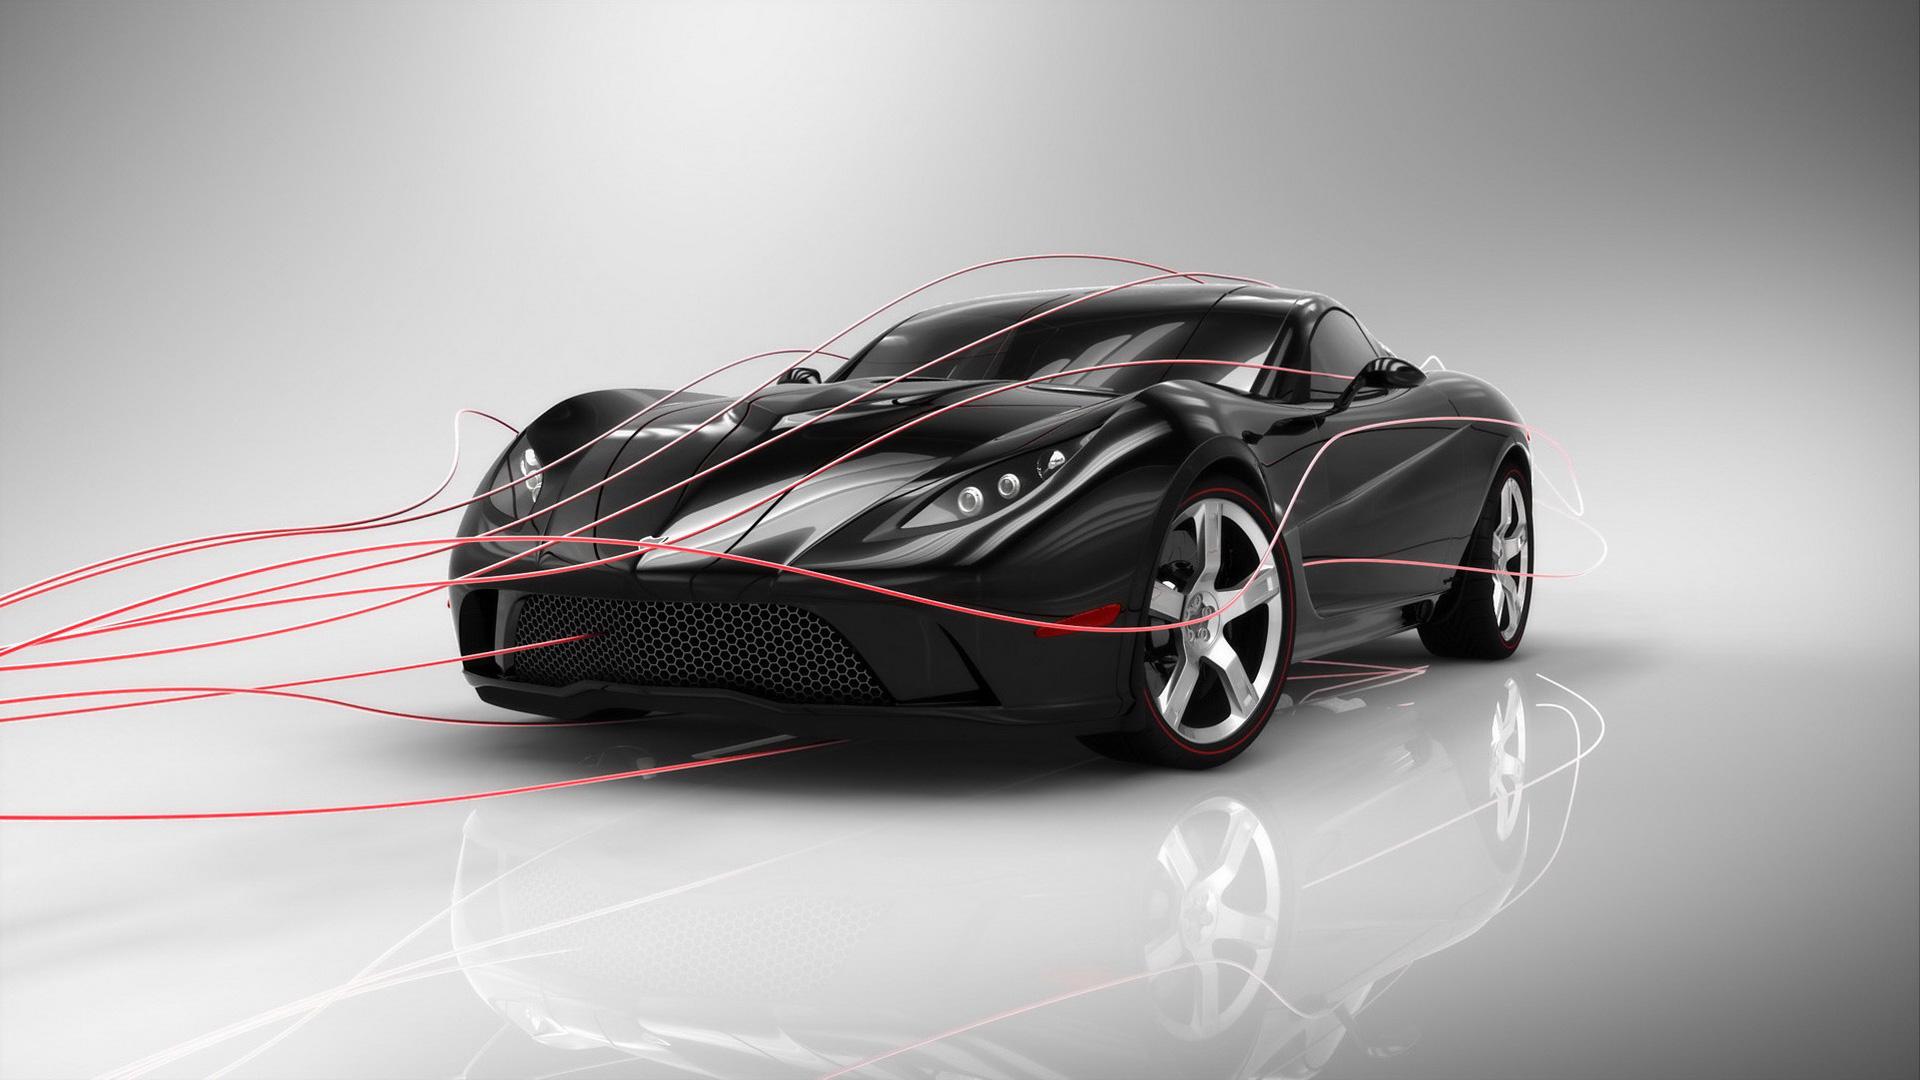 Hd wallpapers of cars - Corvette Mallett Concept Car Wallpapers Hd Wallpapers